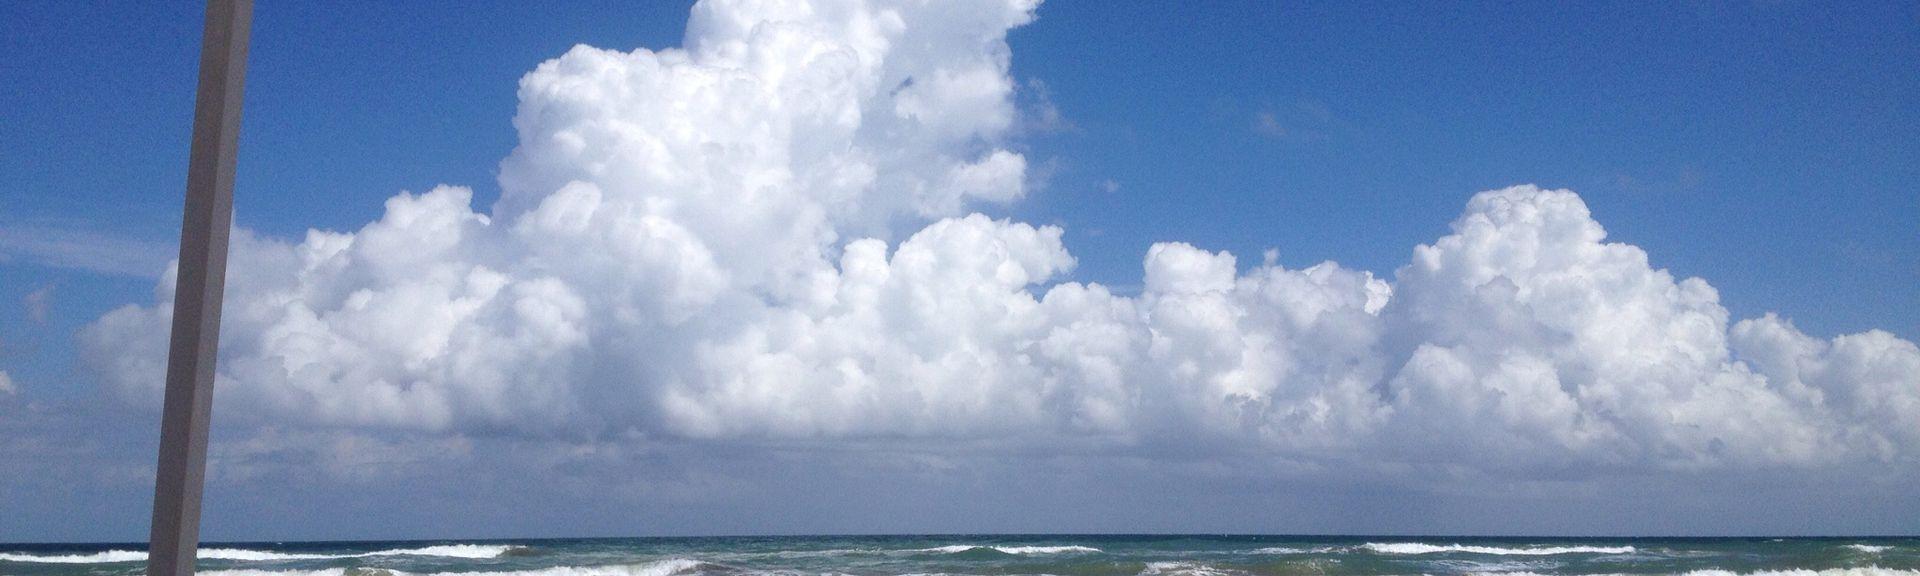 Bahia Mar, South Padre Island, Texas, United States of America